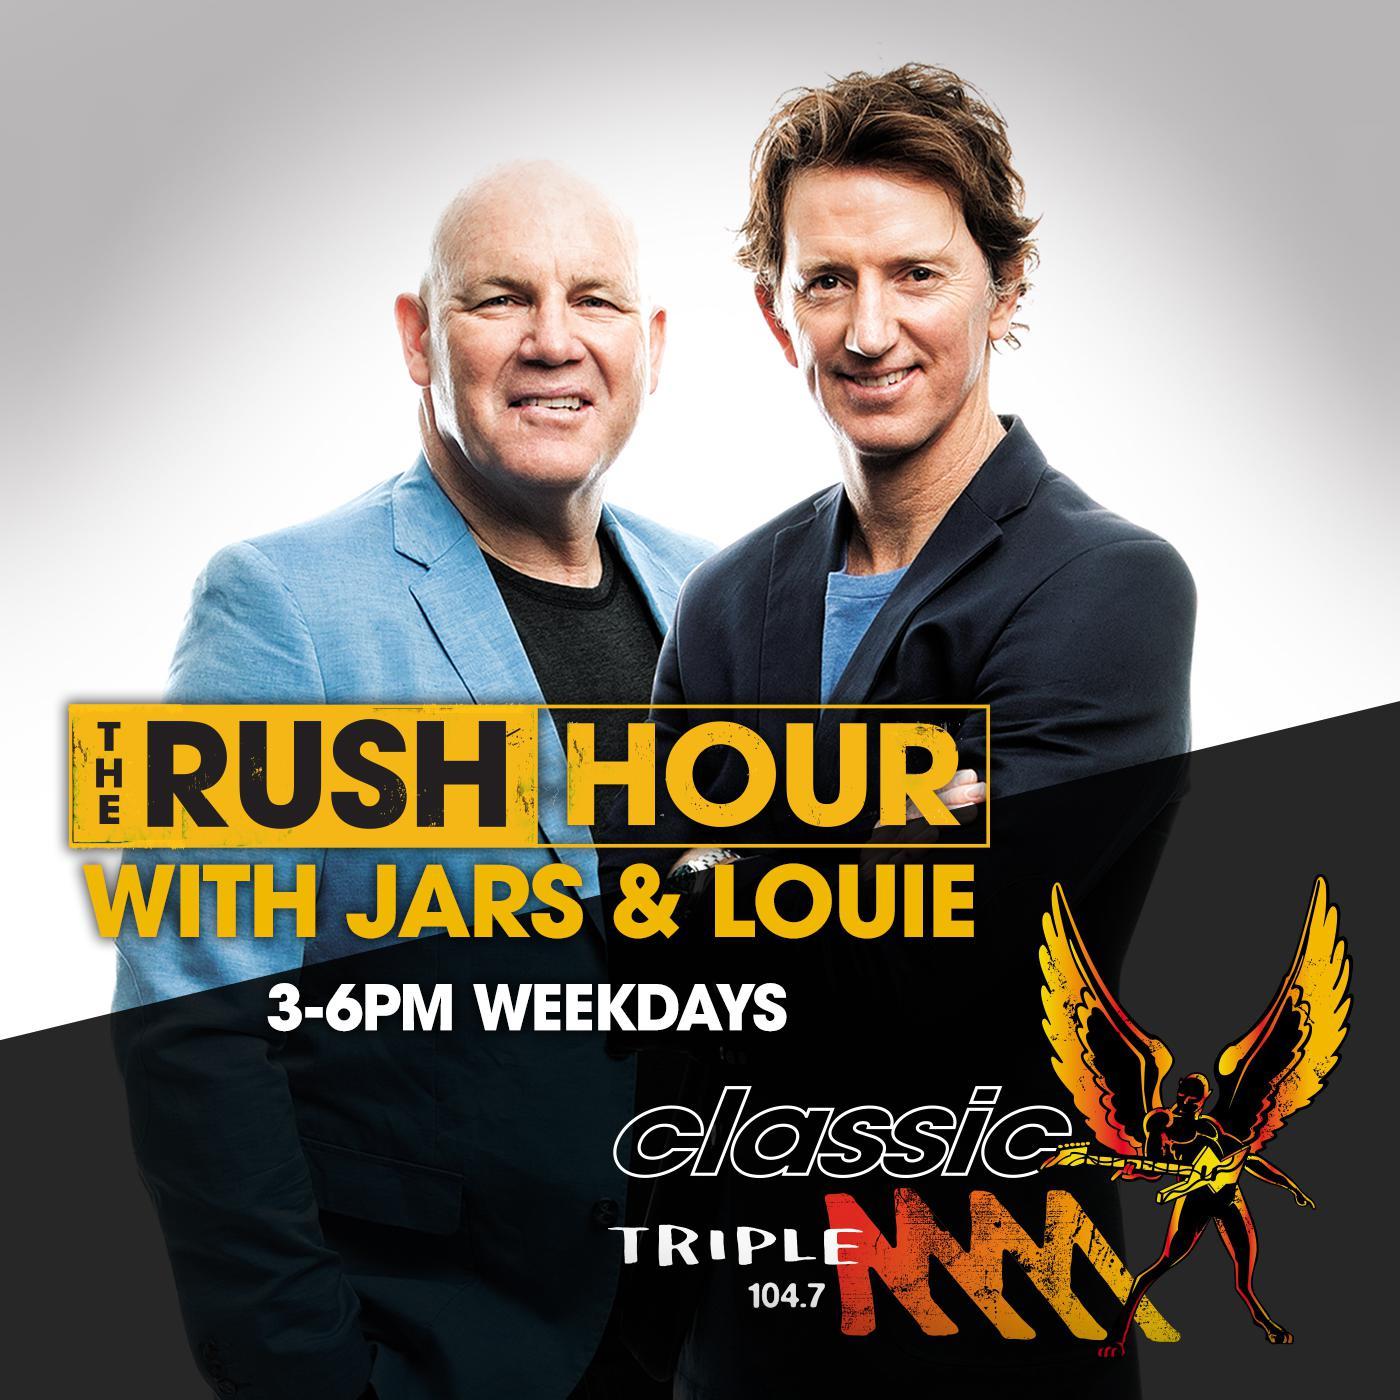 Image Belonging to Triple M, taken offhttp://www.triplem.com.au/adelaide/shows/rush-hour-adelaide/podcast/thursday-11-june-2015/